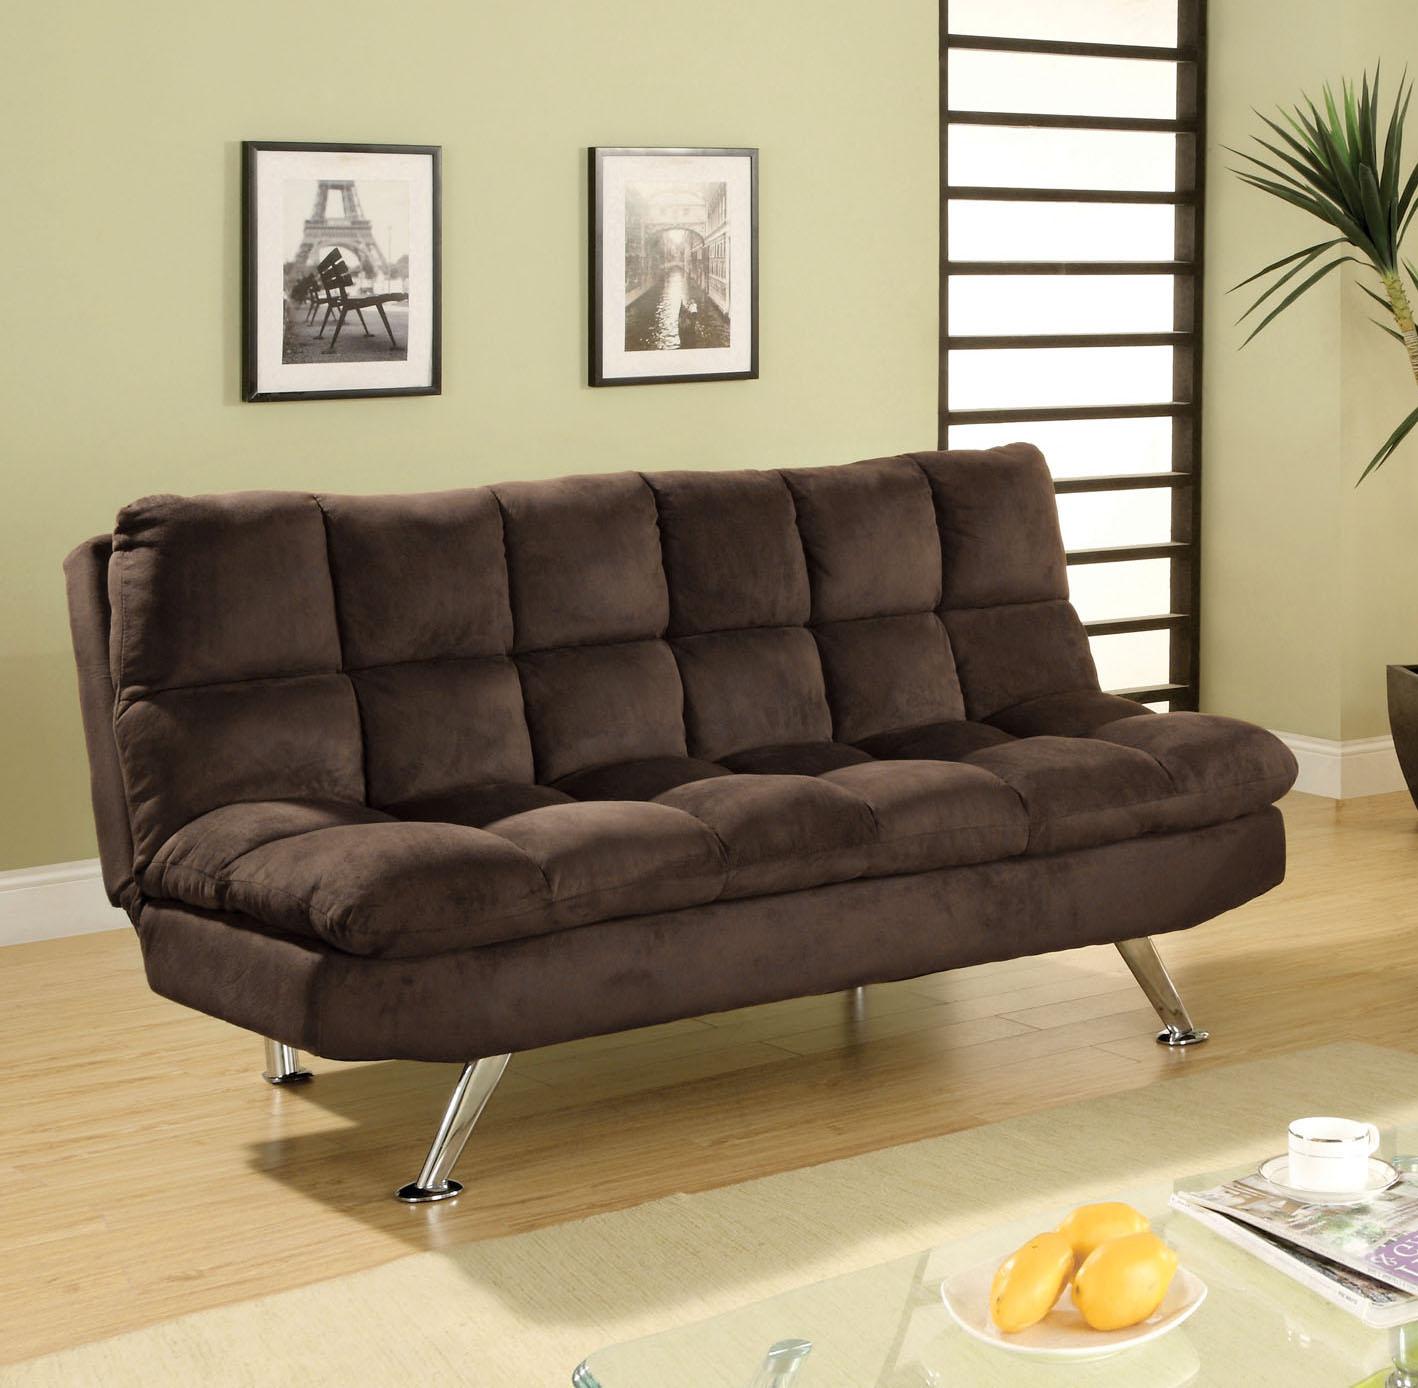 sears clearwater sofa sectional indian wooden uk furniture of america brown jordin microfiber futon